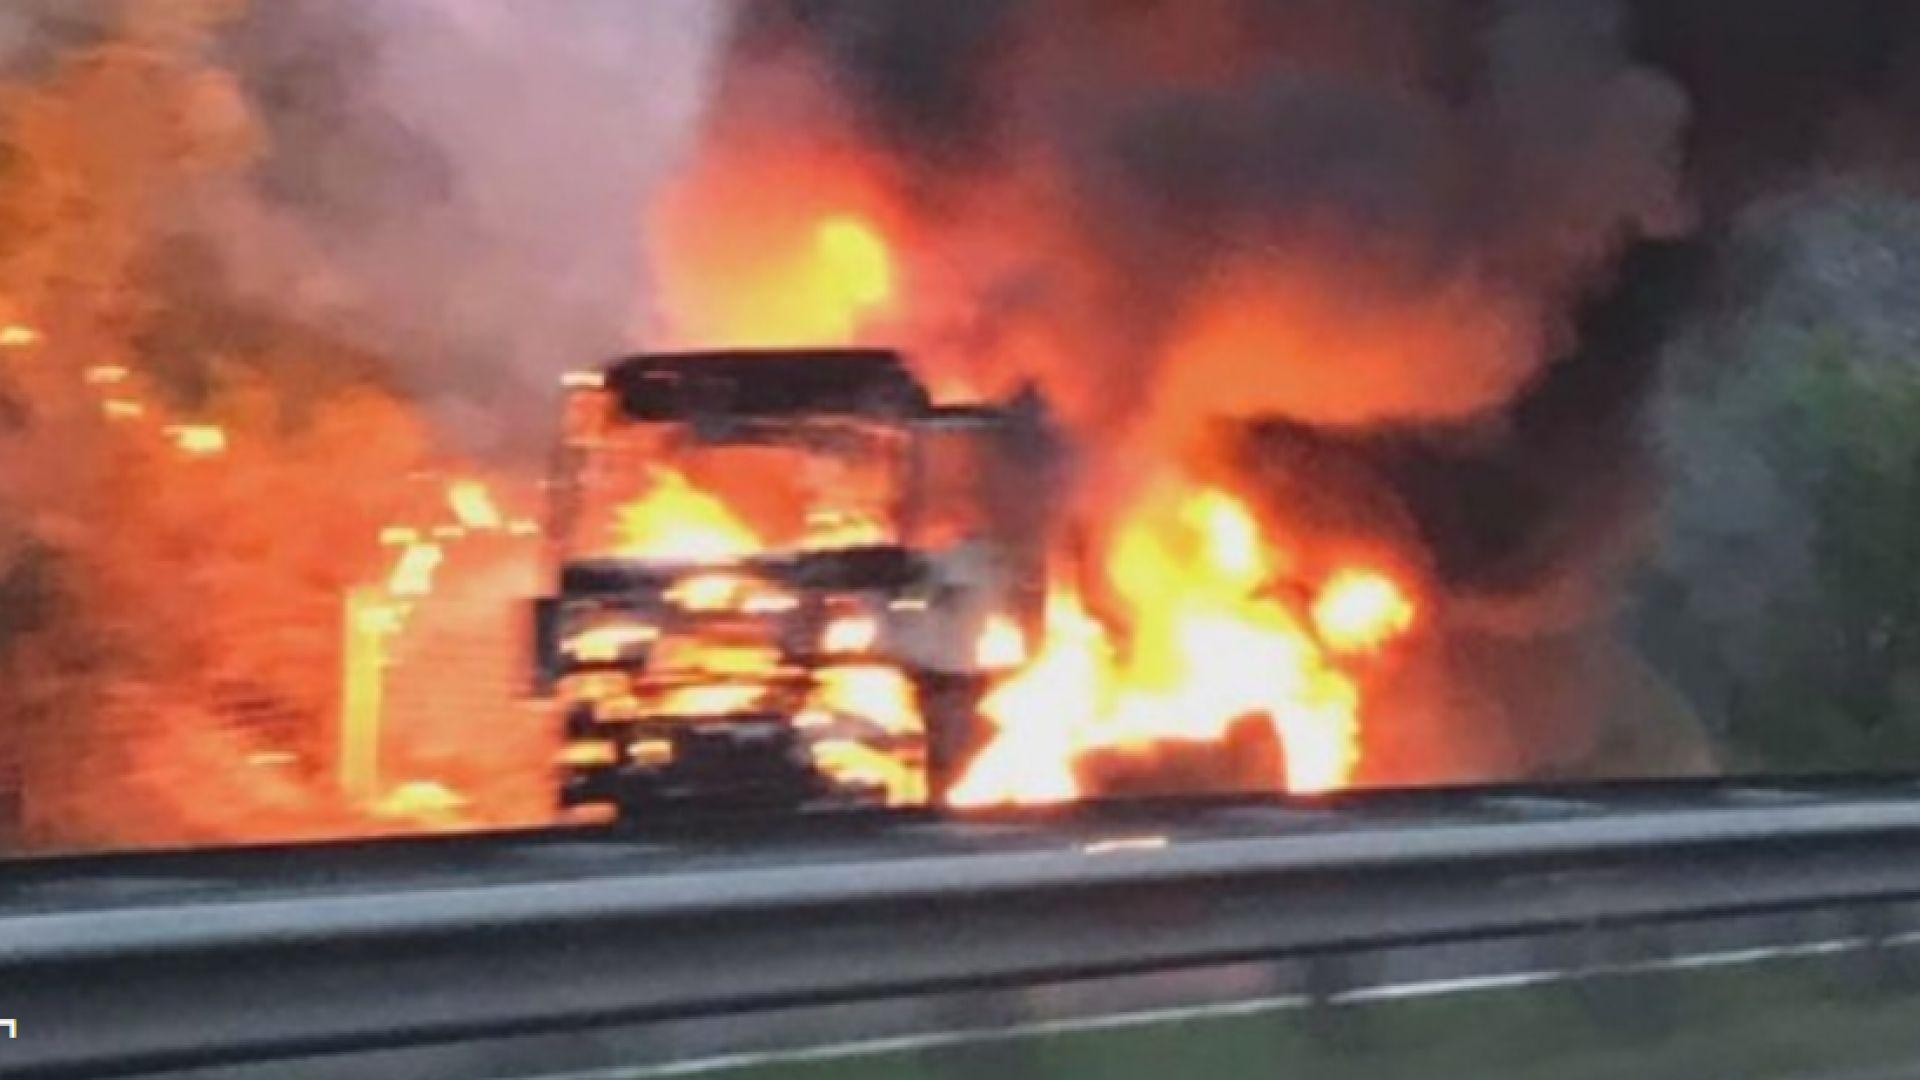 Тежкотоварен автомобил се запали в движение и изгоря на магистрала